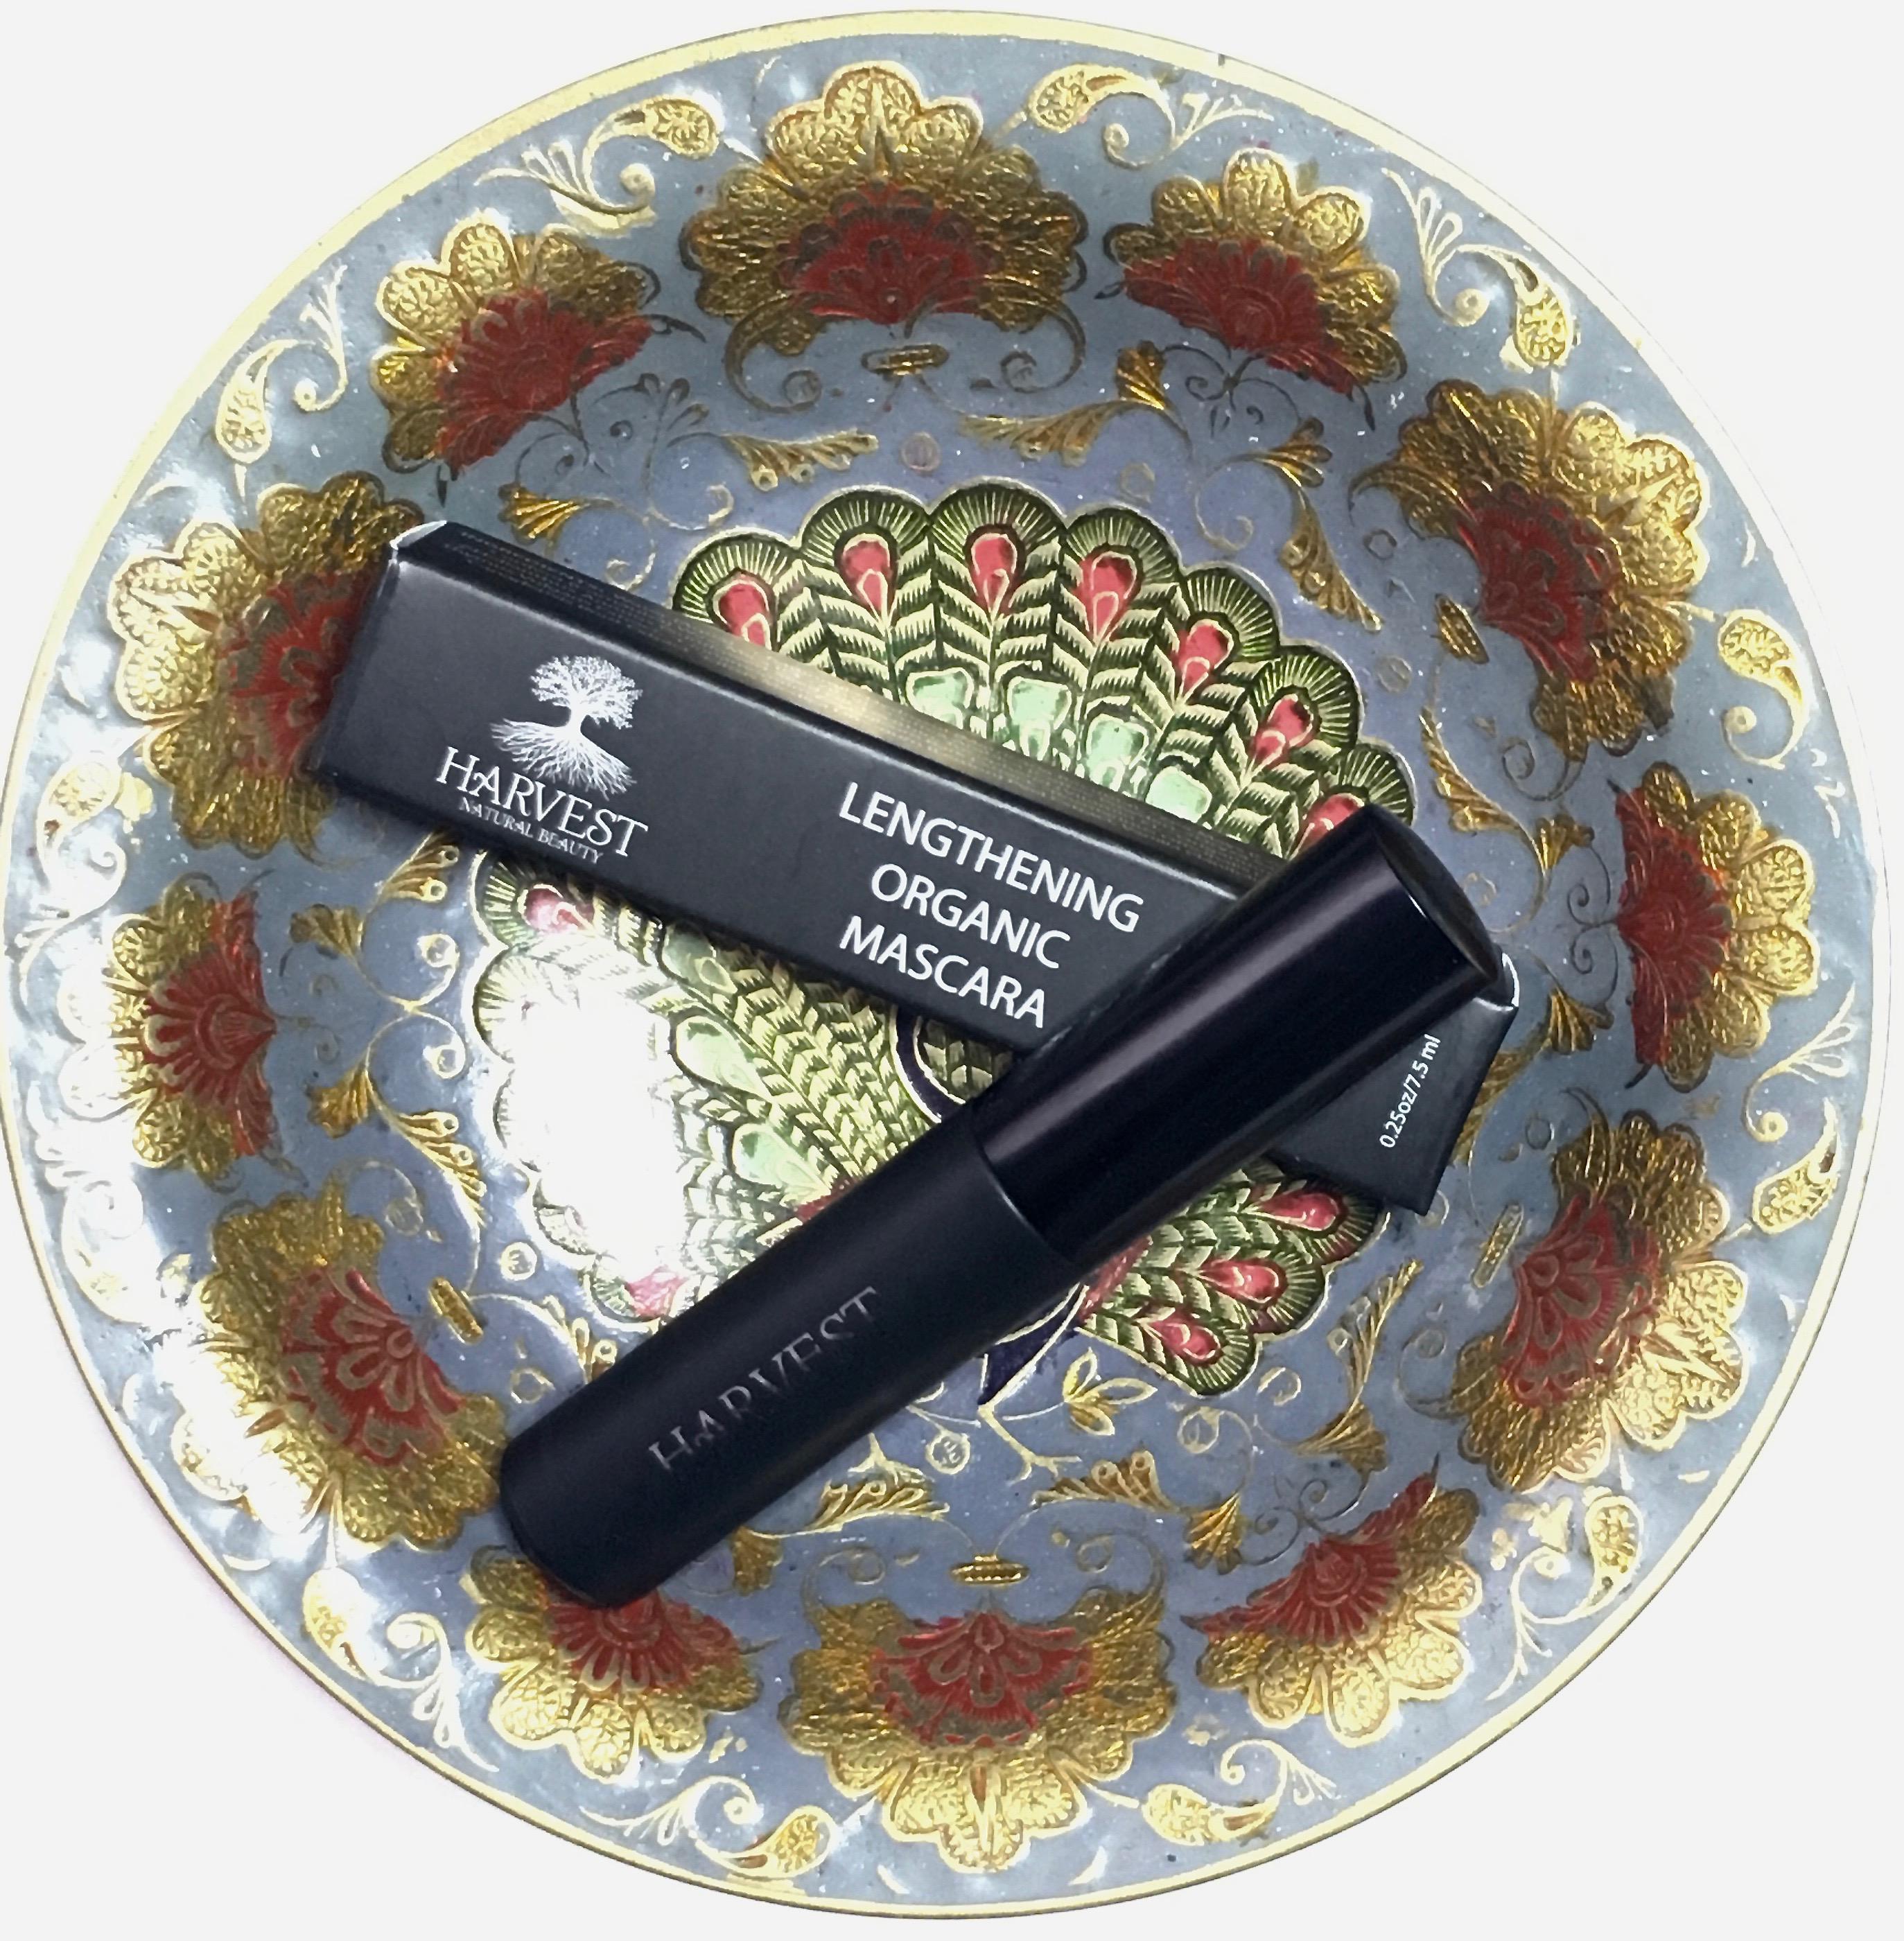 Harvest Natural Beauty Lengthening Organic Mascara